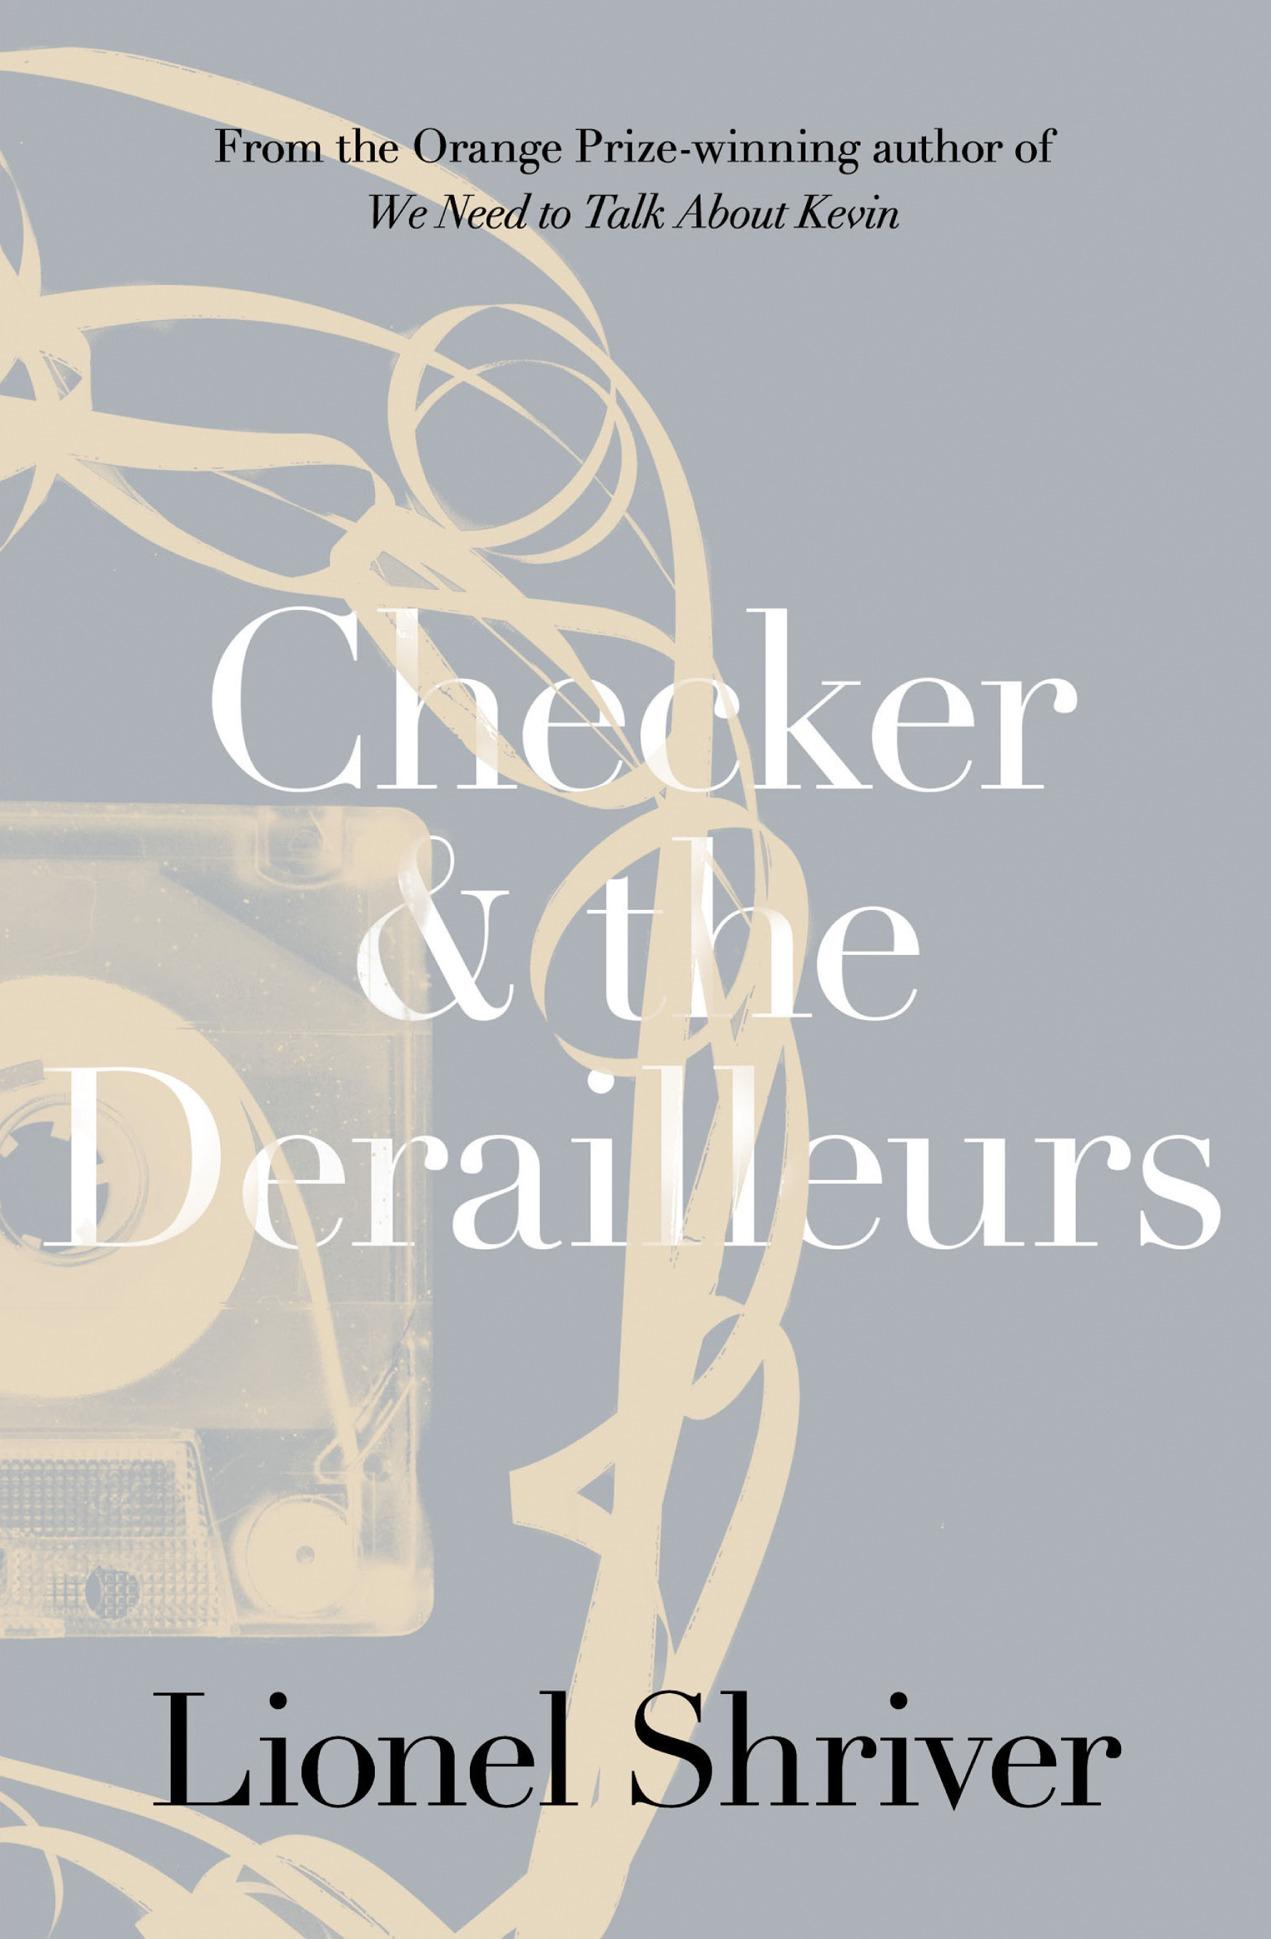 все цены на Lionel Shriver Checker and the Derailleurs онлайн